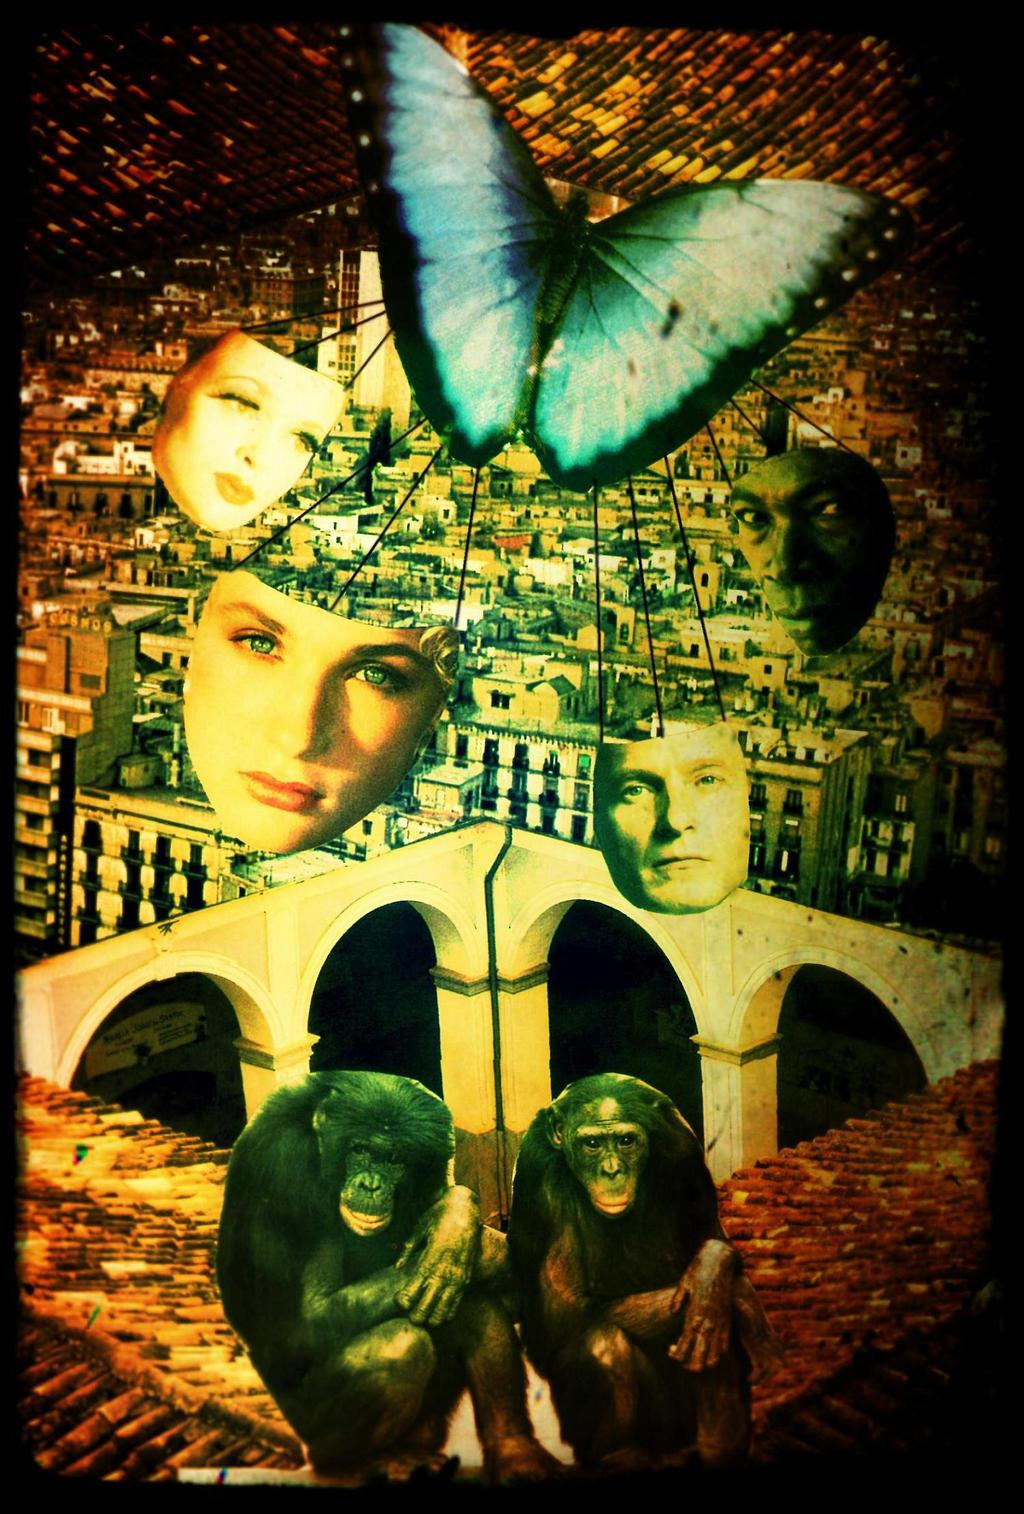 Sonho da Borboleta by hpfil